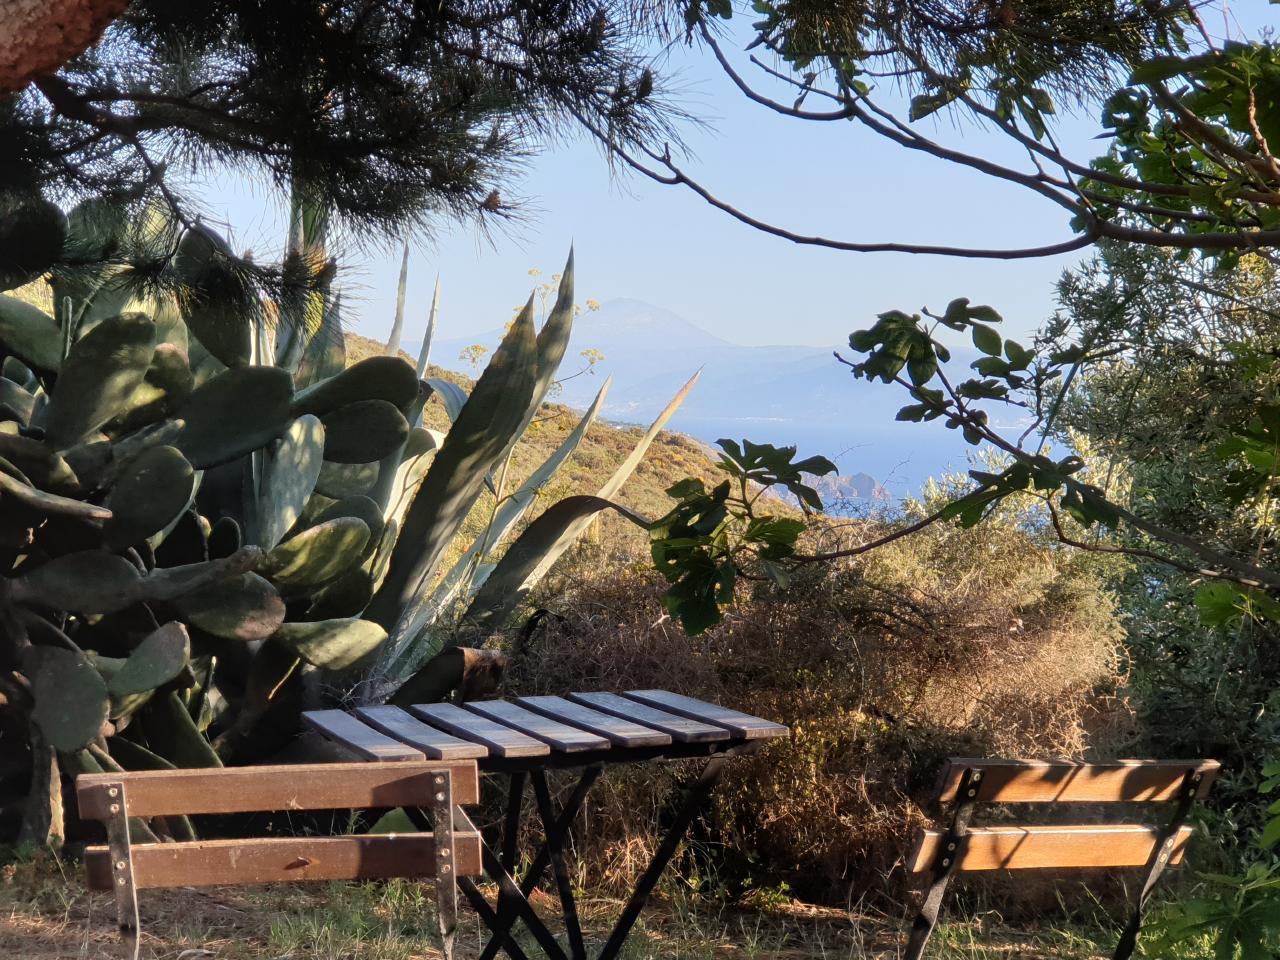 Maison de vacances Casetta Eoliana Lipari Inseln, pool, sauna. (827872), Lipari, Lipari, Sicile, Italie, image 27